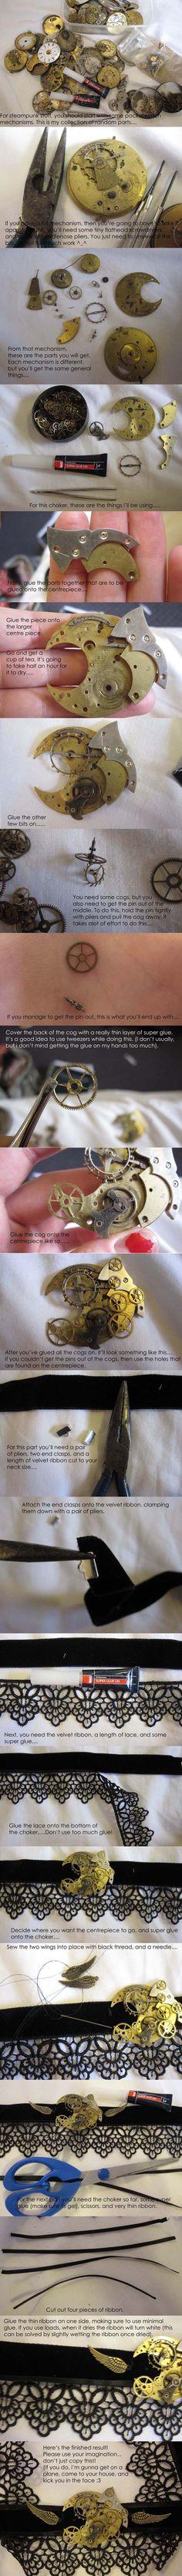 steampunk necklace DIY ... http://gothic-enchantress.deviantart.com/art/Steampunk-jewellery-tutorial-142394709